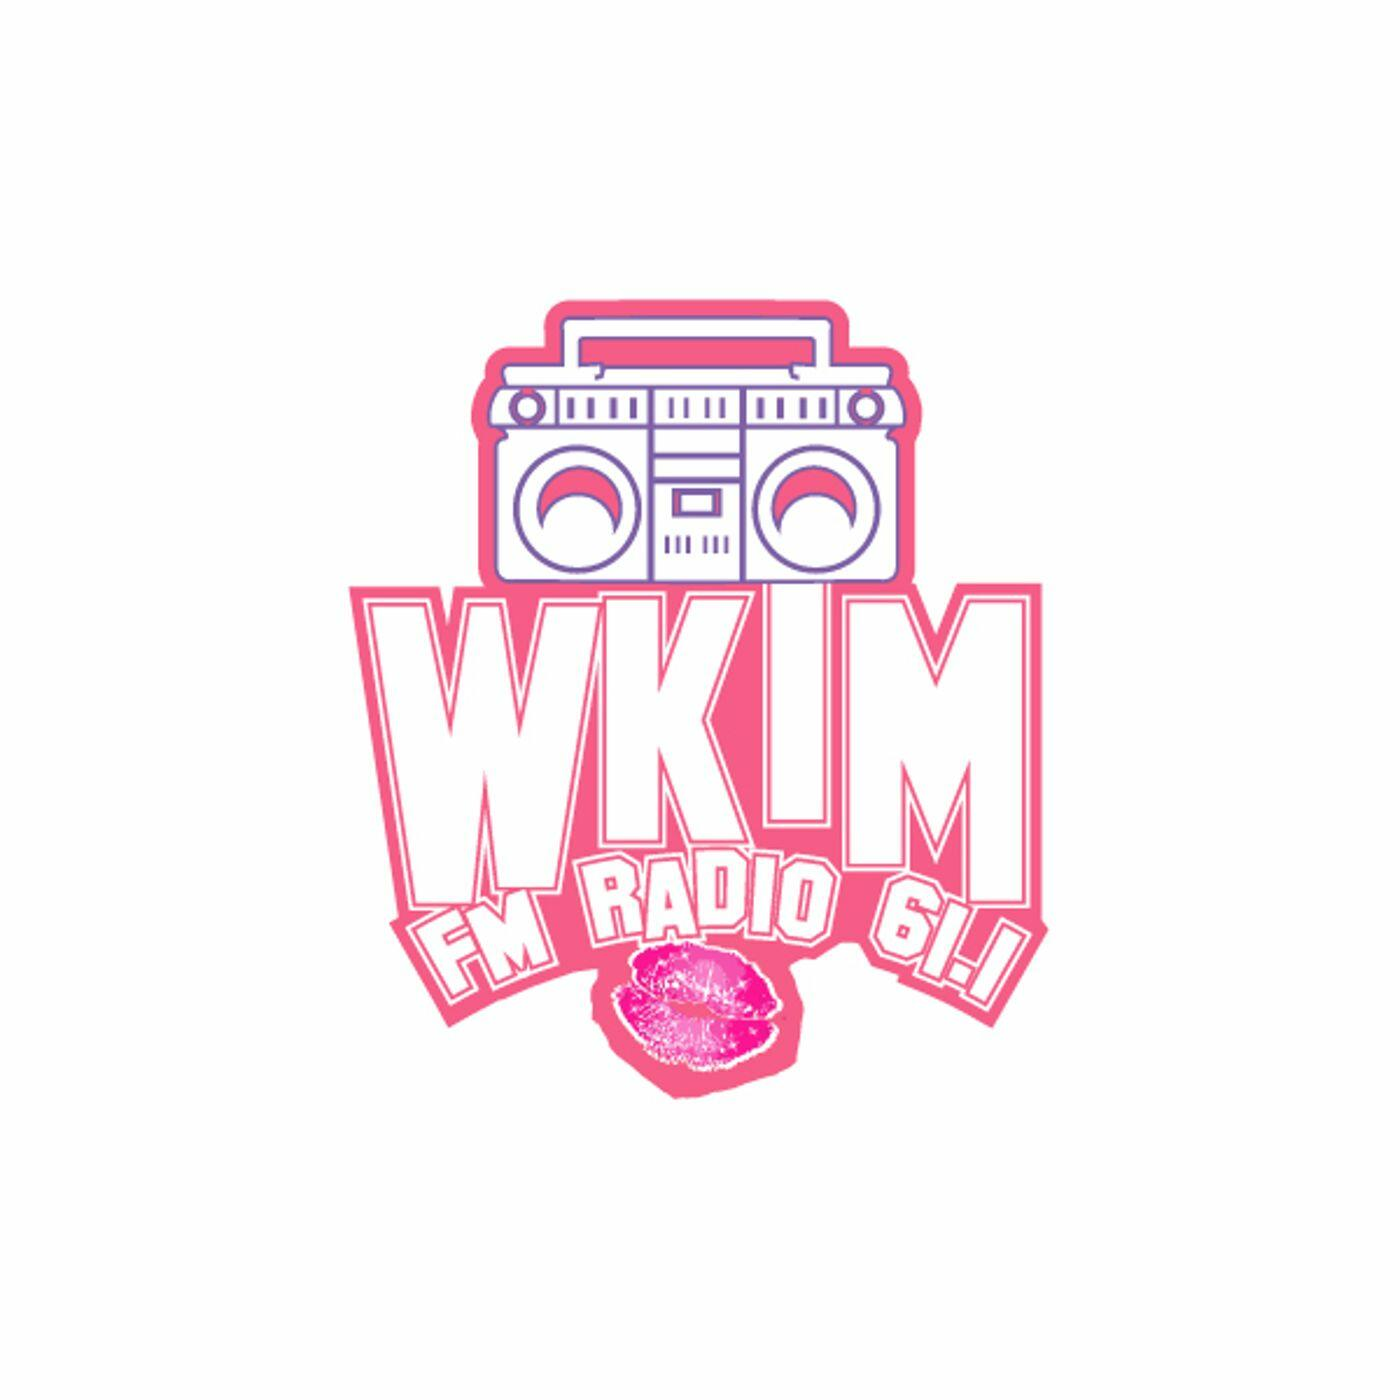 WKIM FM 61.1 Radio Show